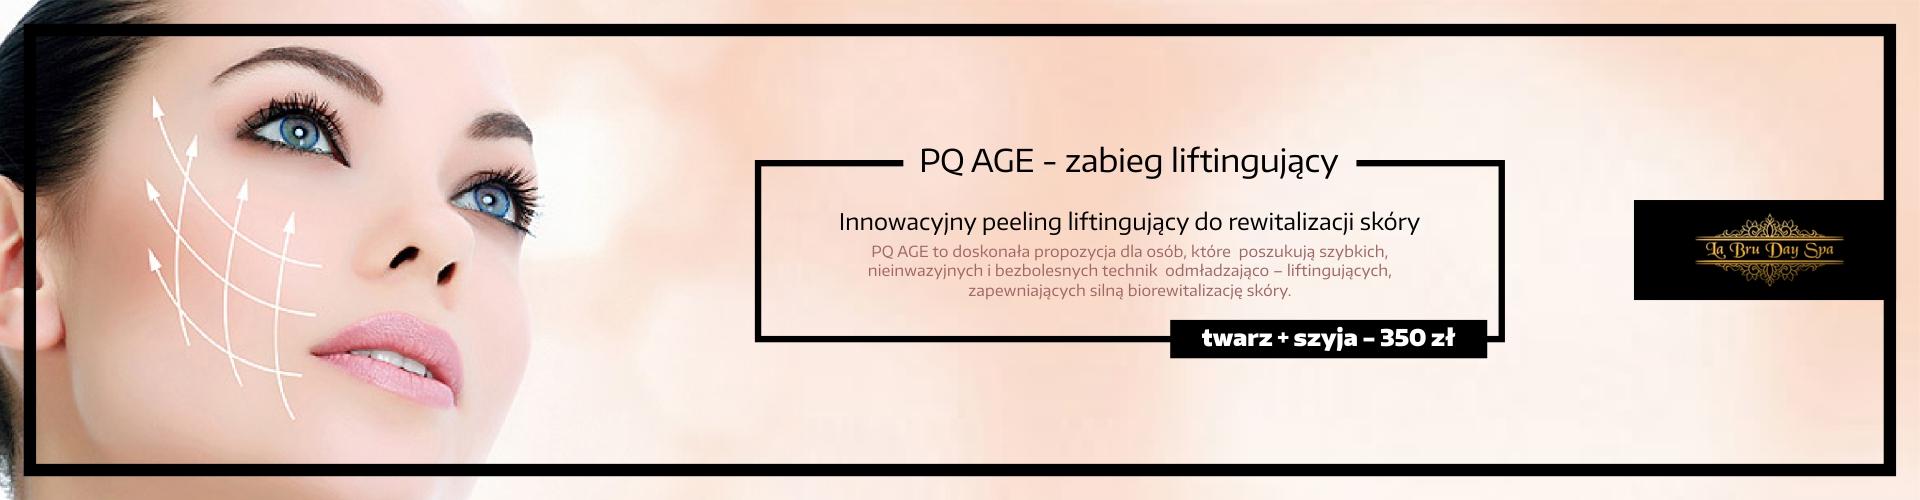 pqage_spa